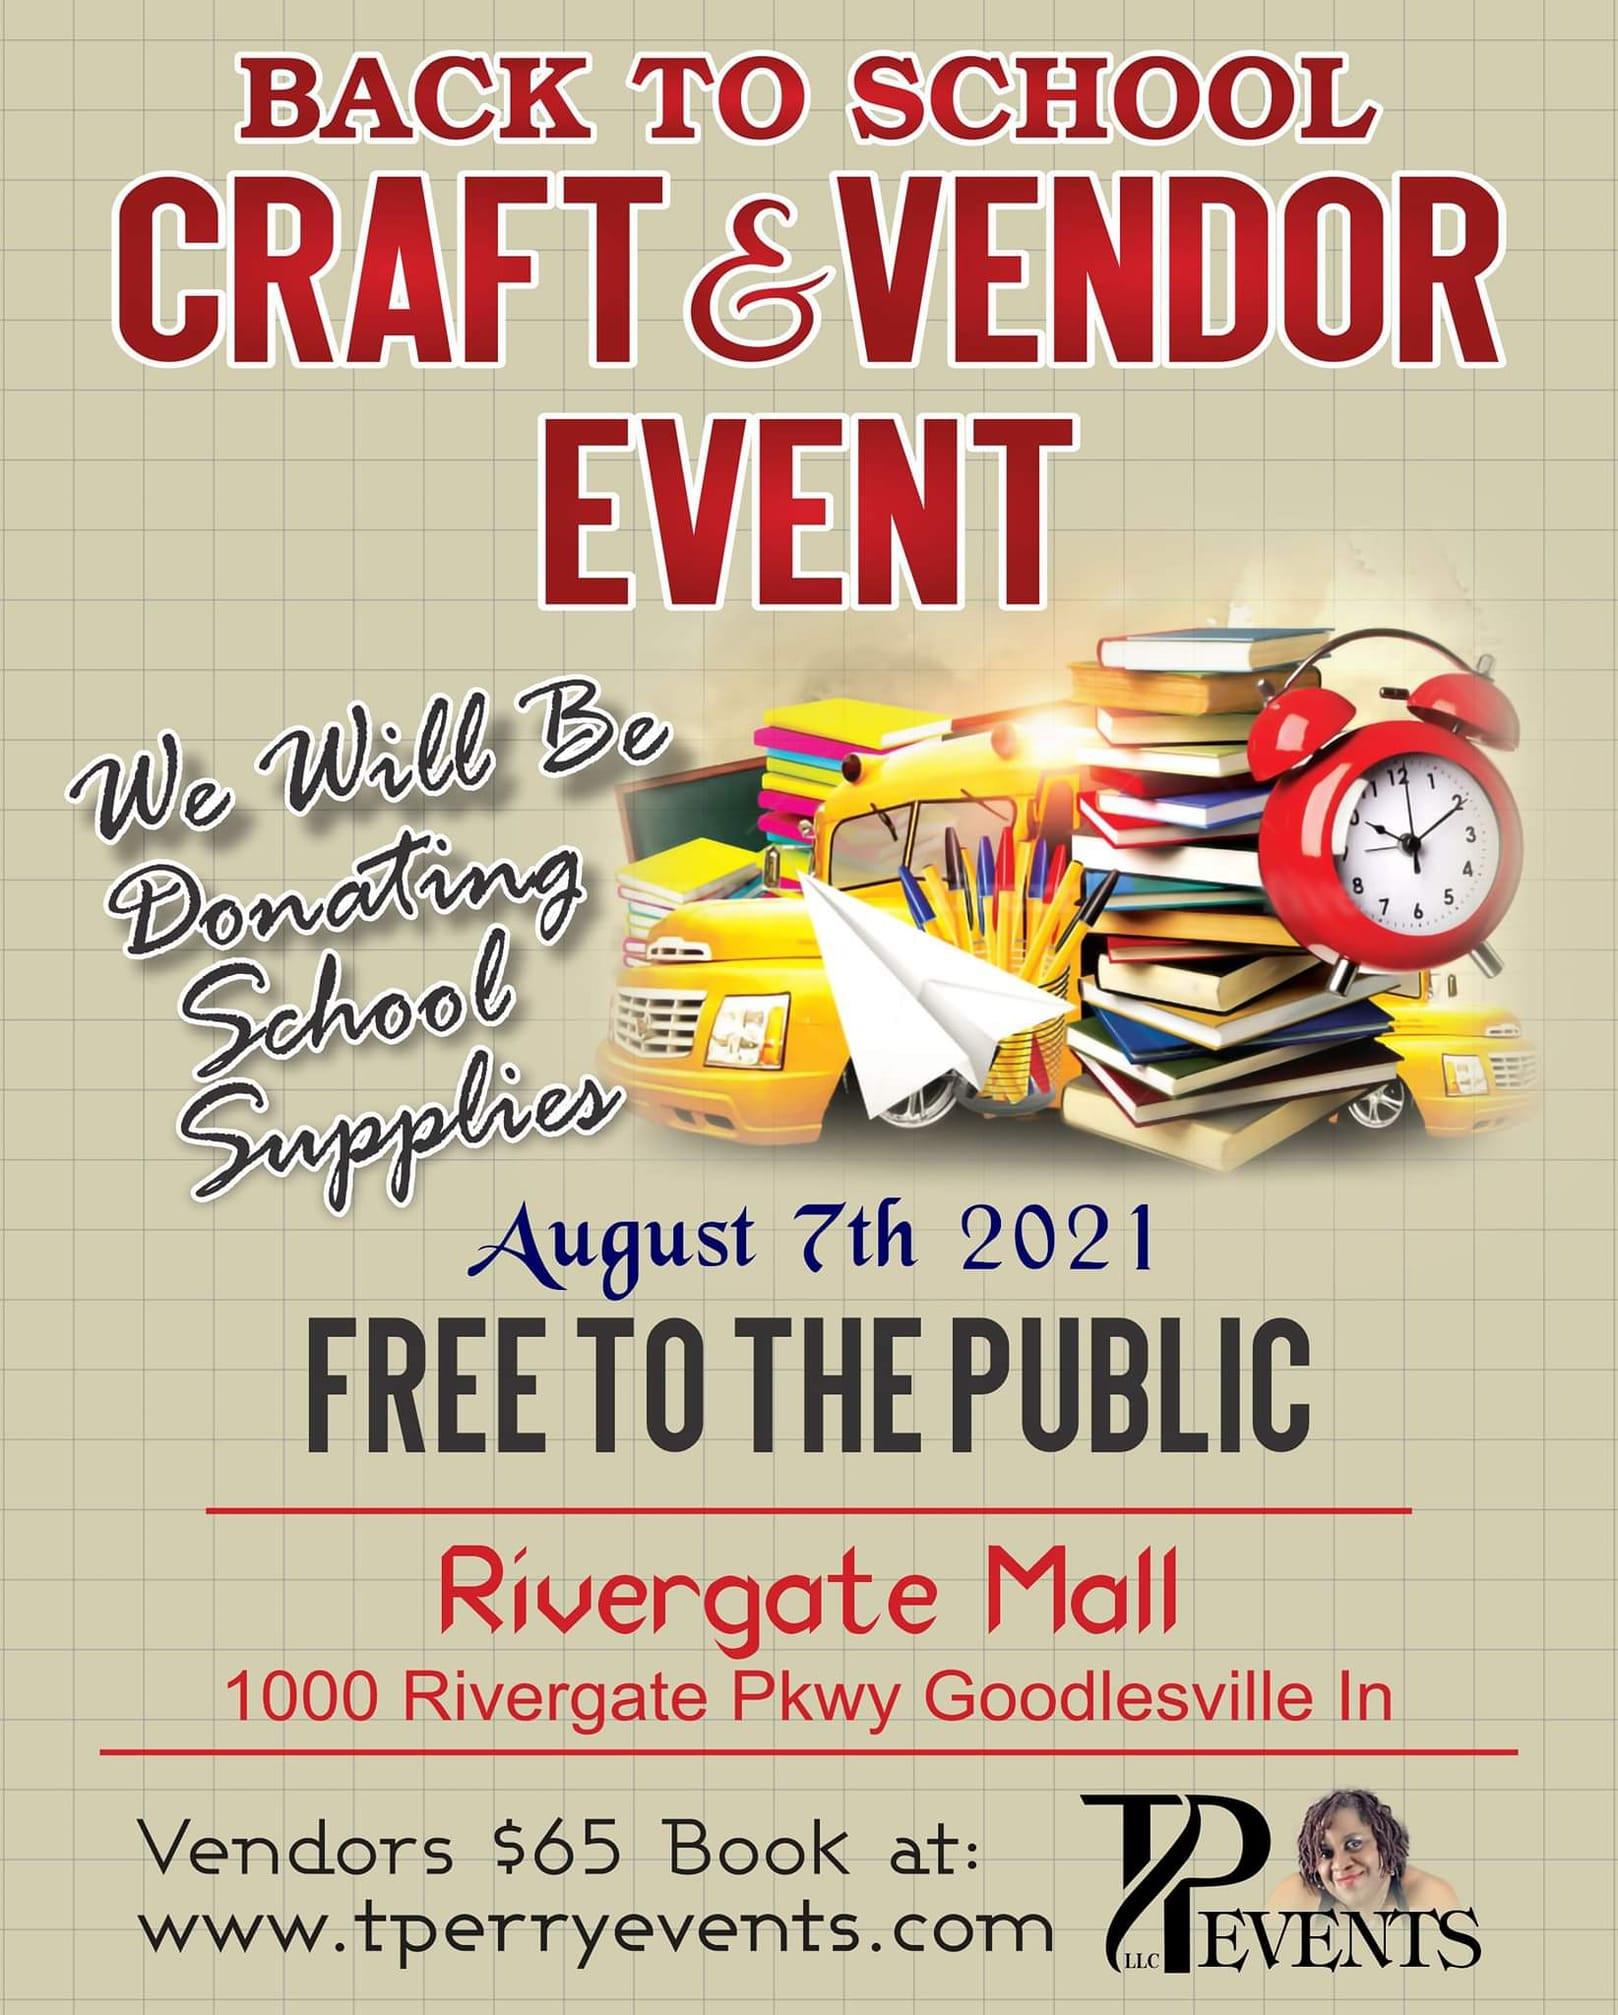 Aug 7th  vendors